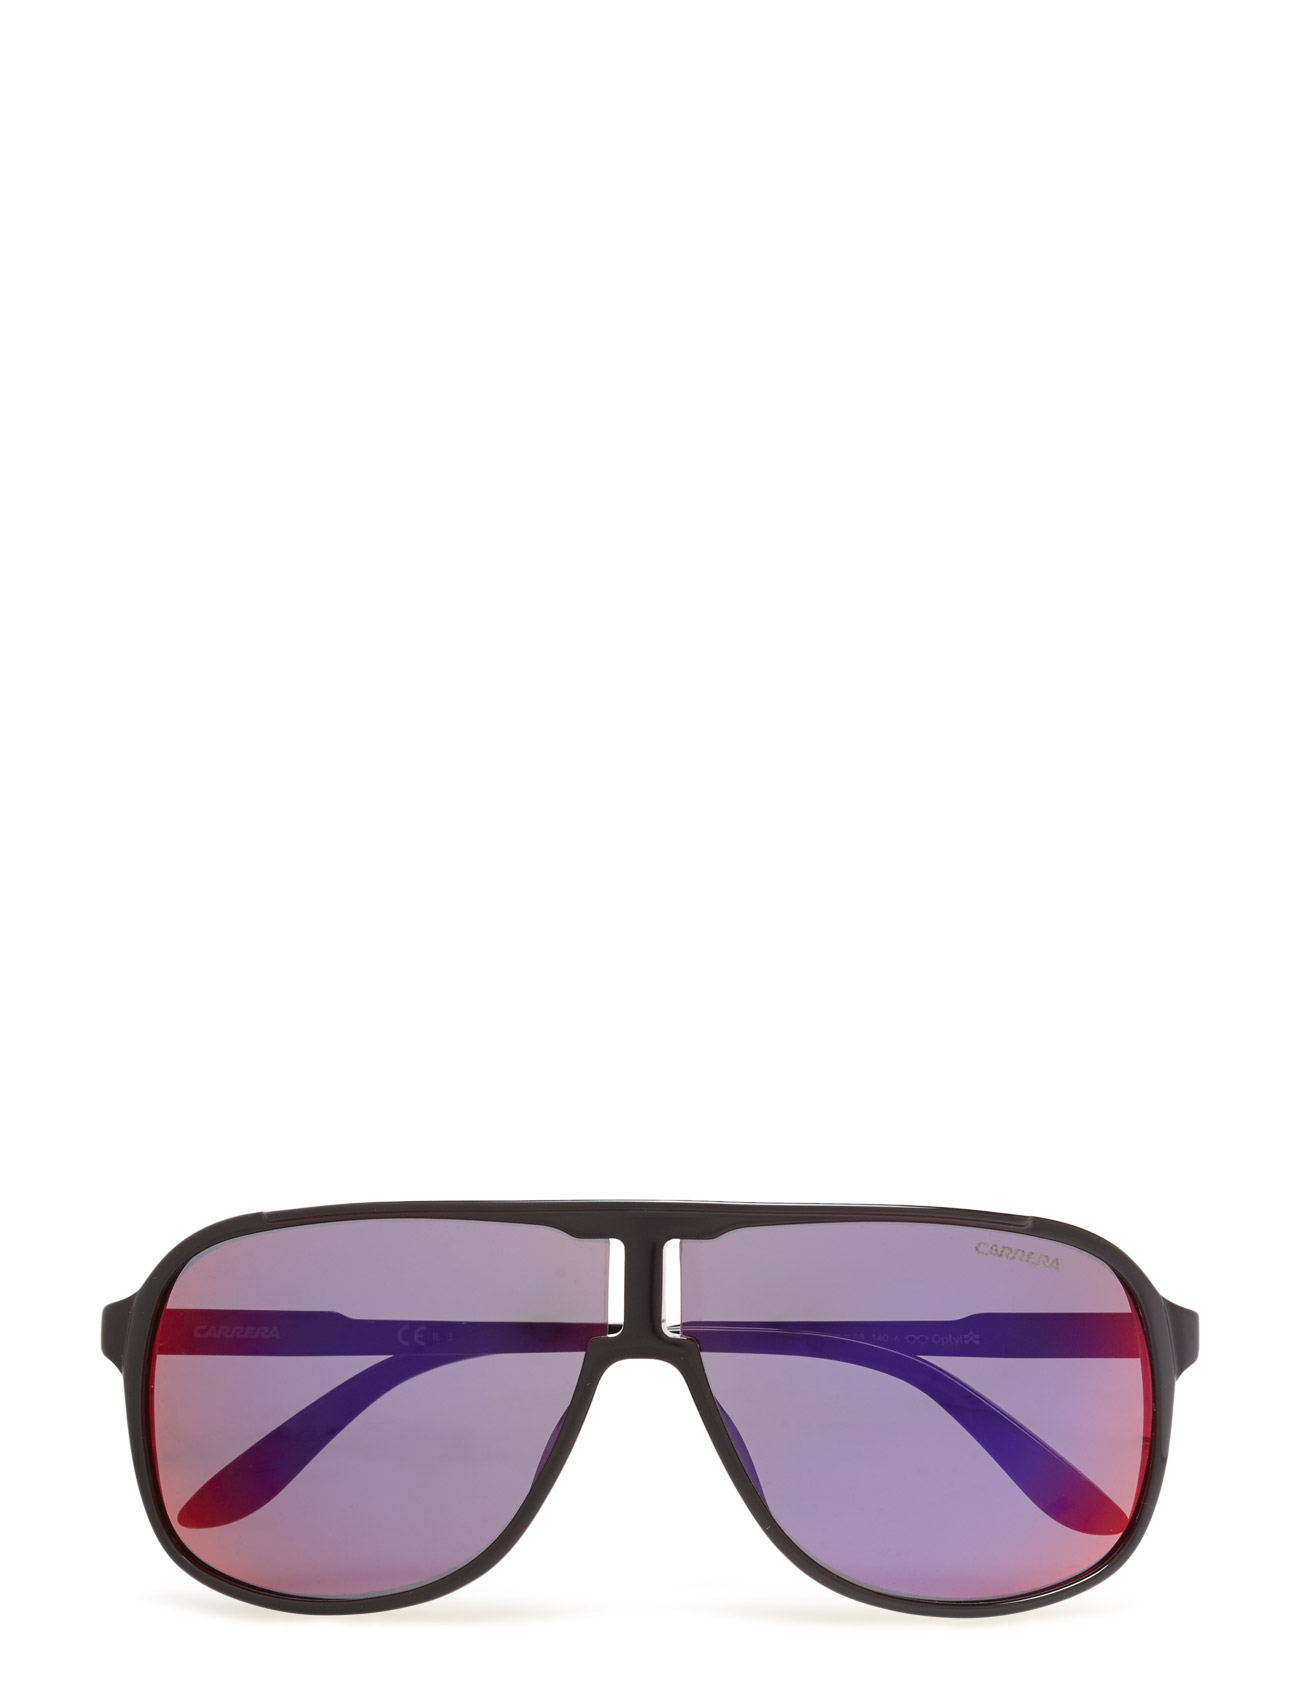 New Safari Carrera Solbriller til Herrer i